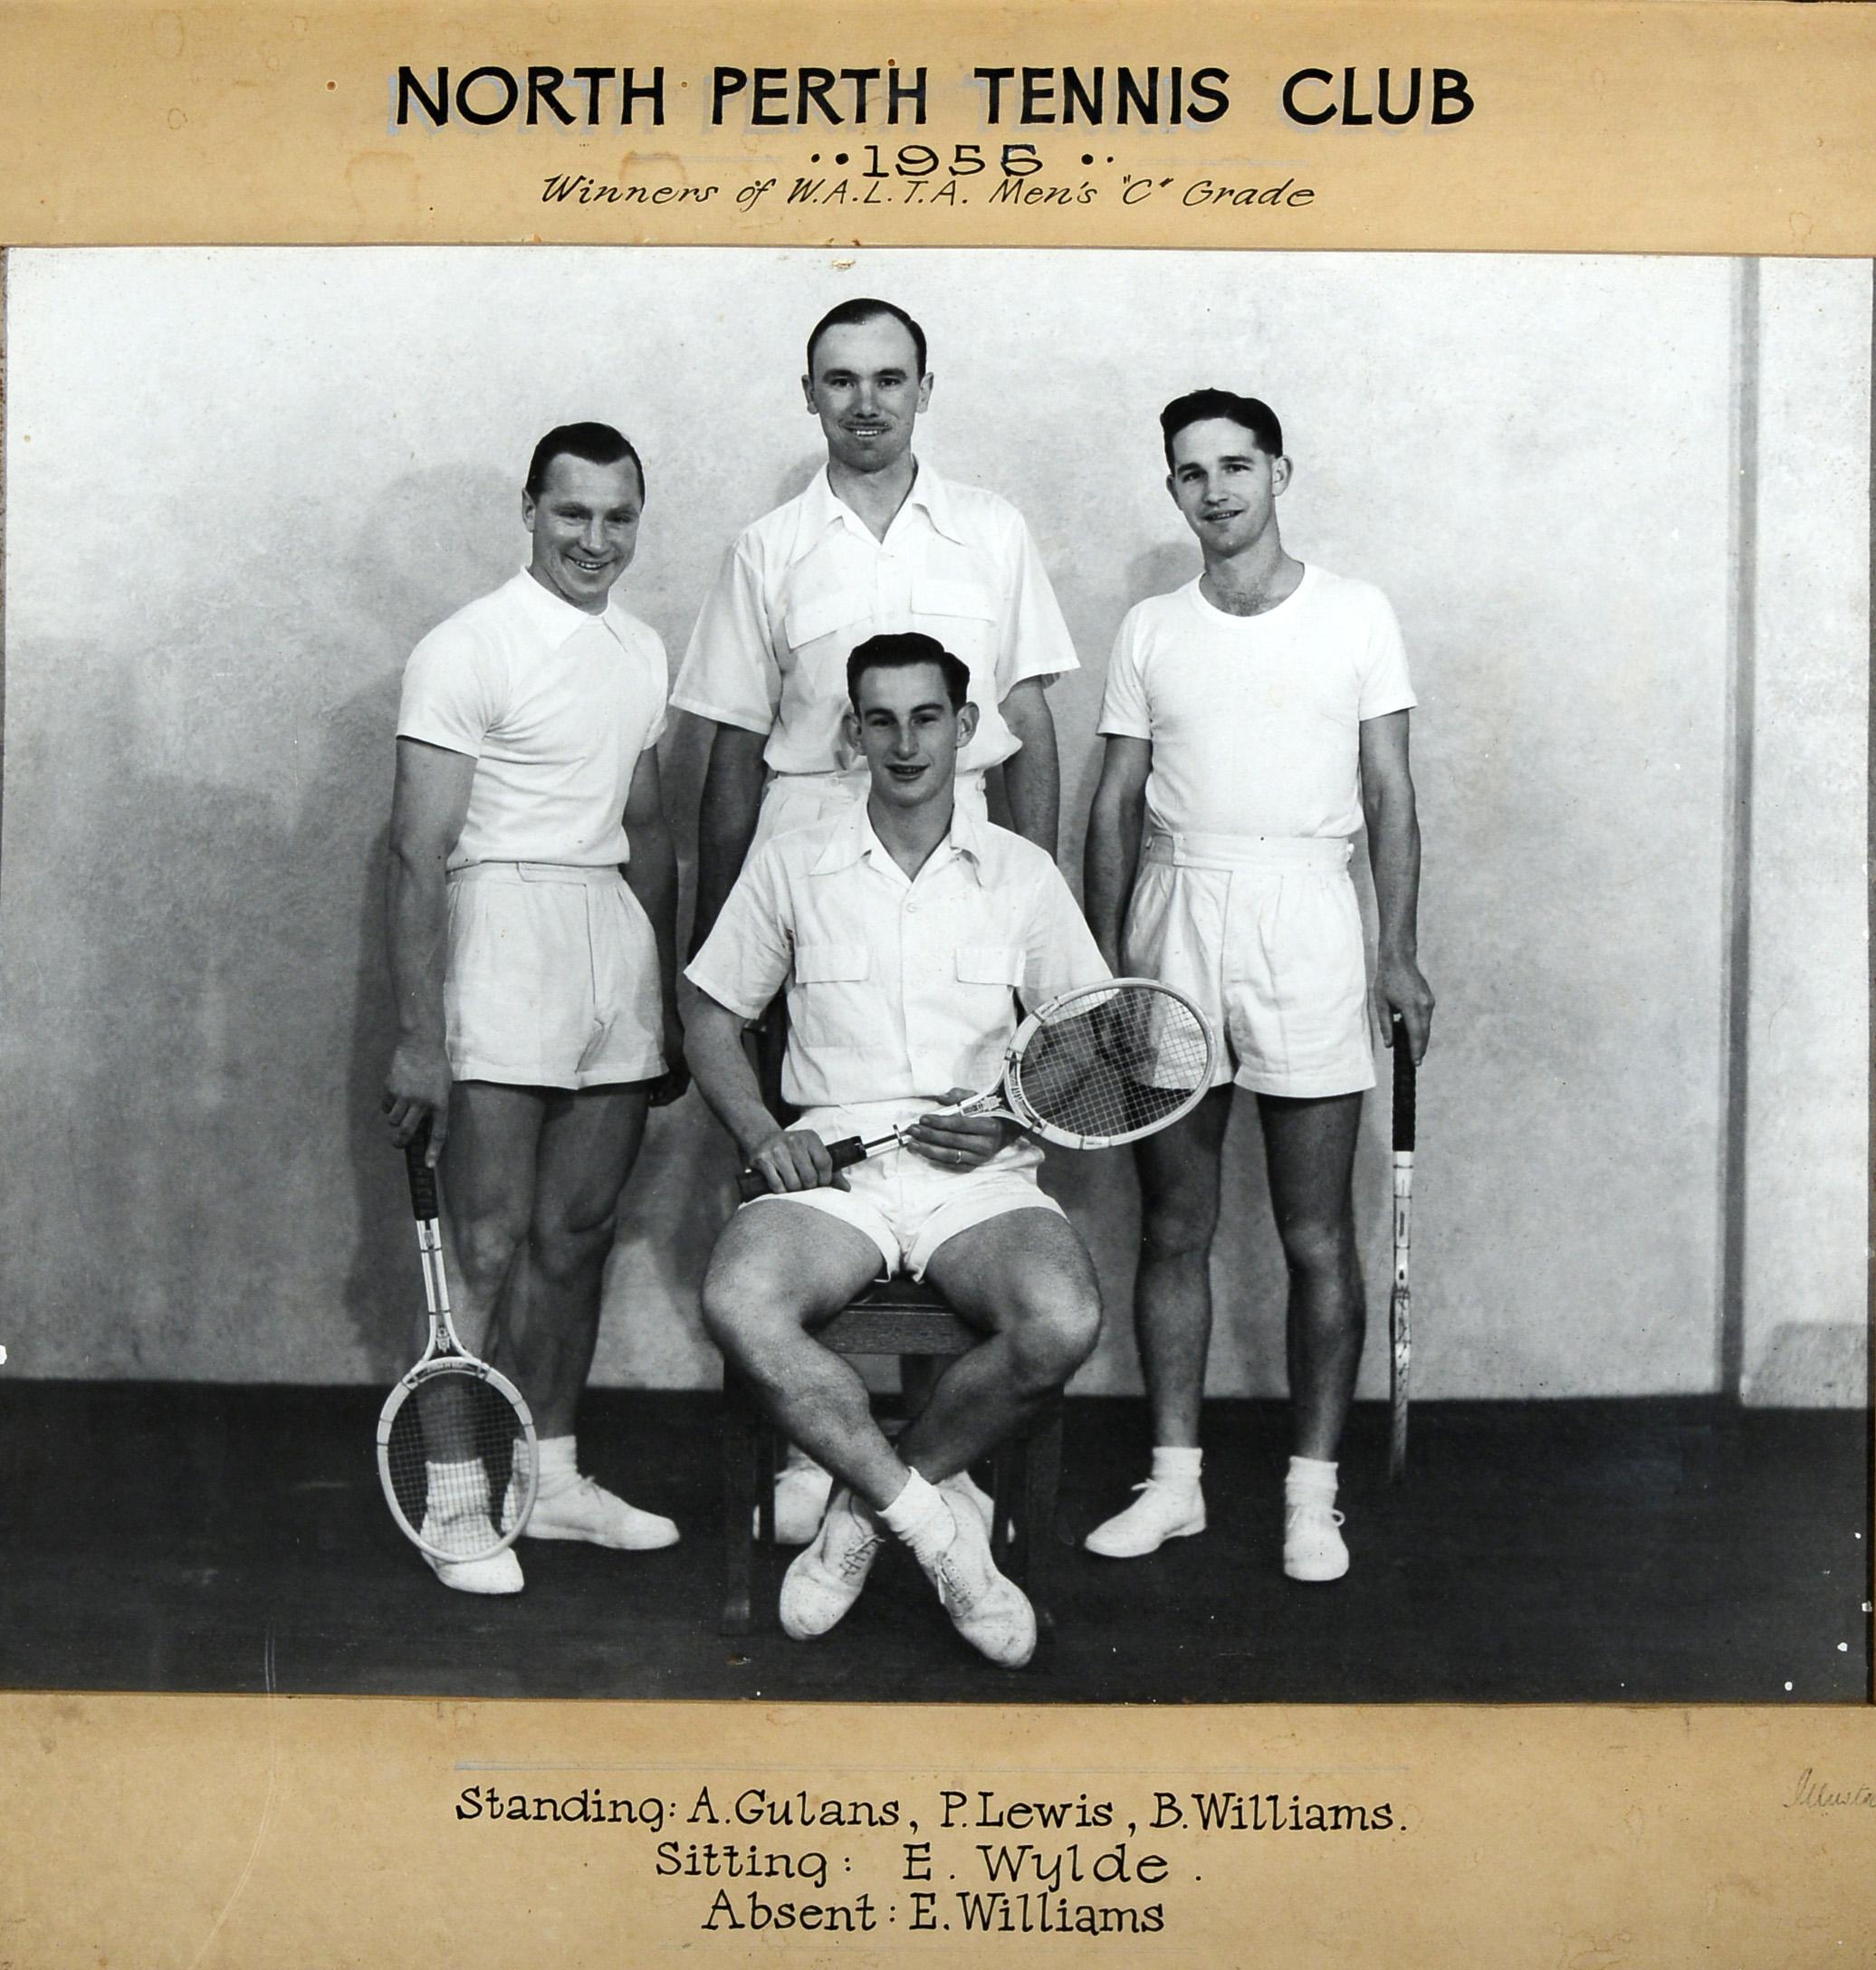 149. North Perth Tennis Club, 1955